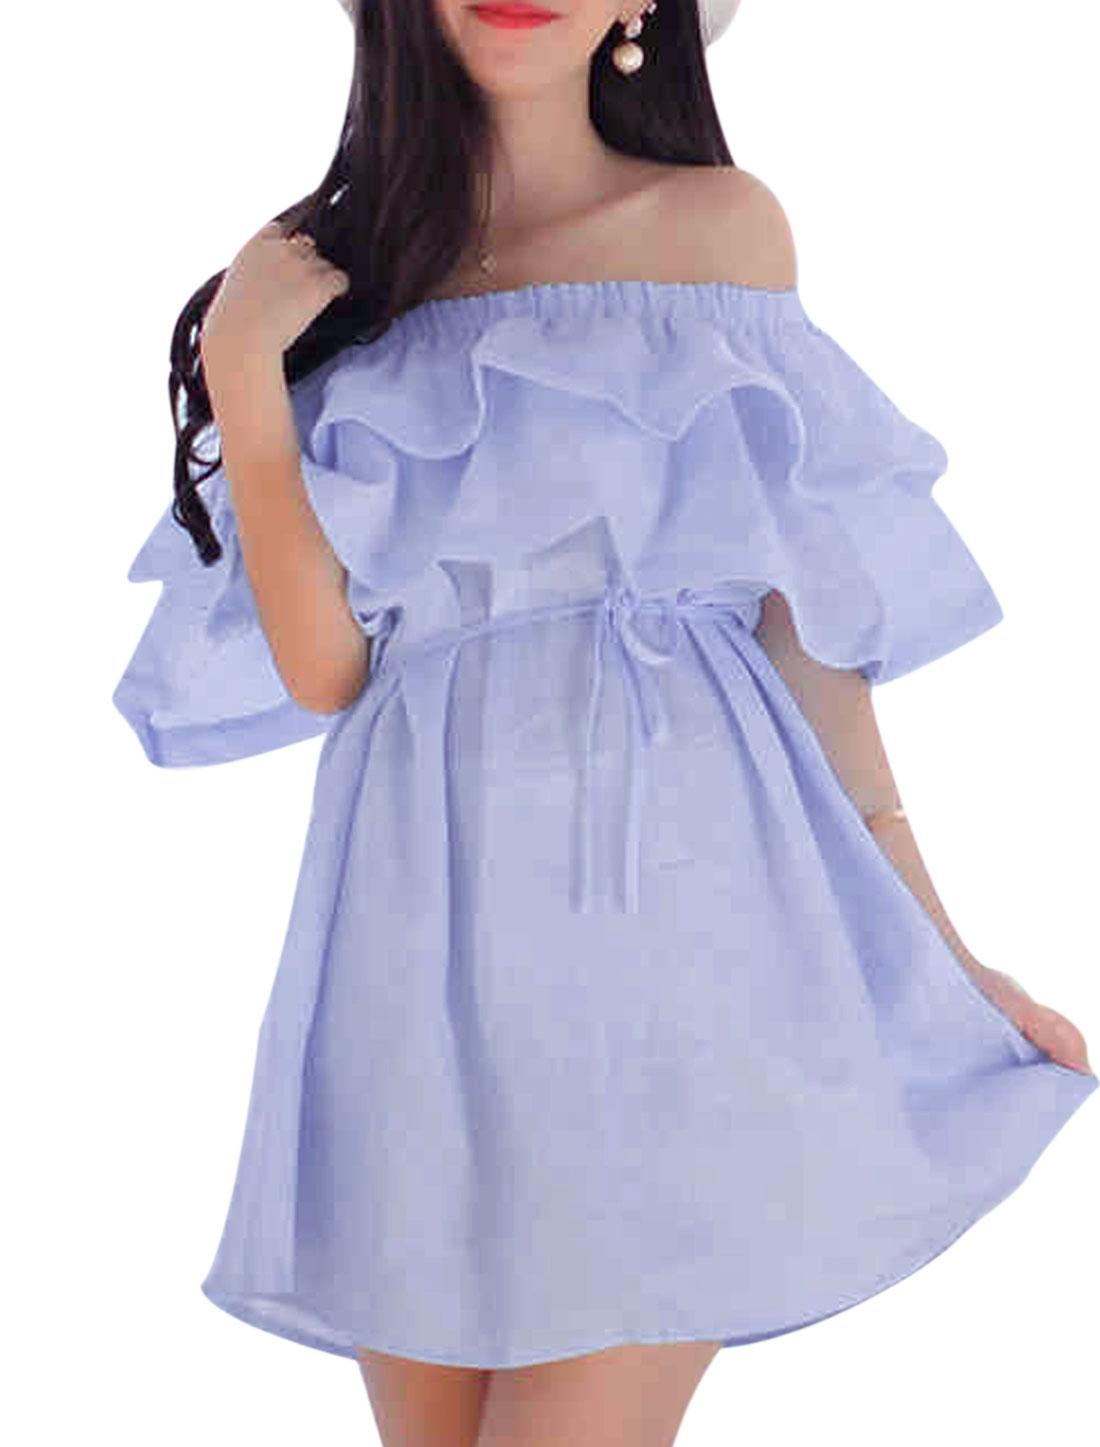 Ladies Fashion Style Summer Wear Off Shouledr Lavender Short Dress XS